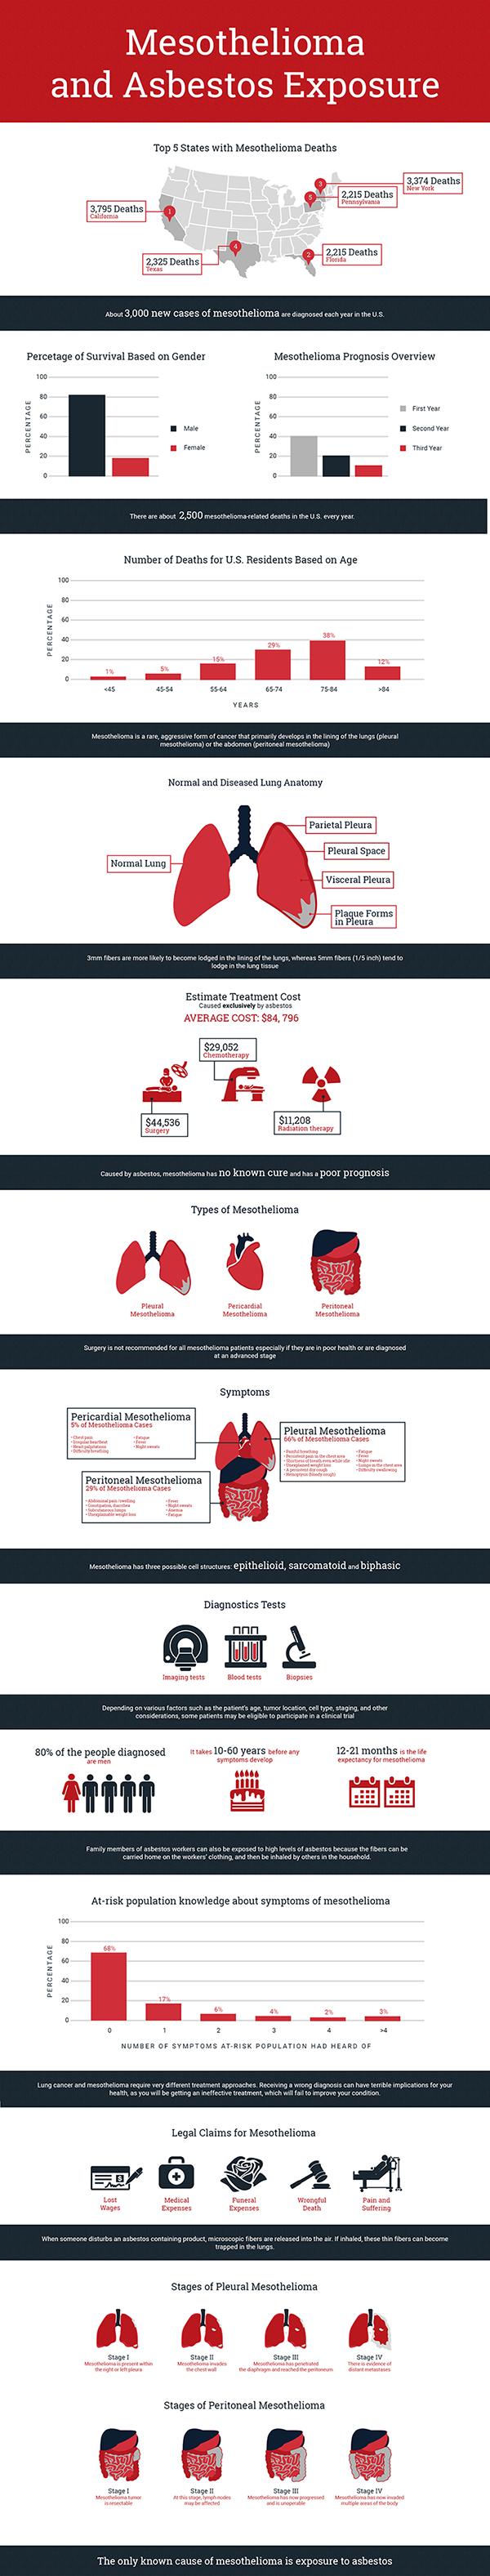 Mesothelioma and Asbestos Exposure